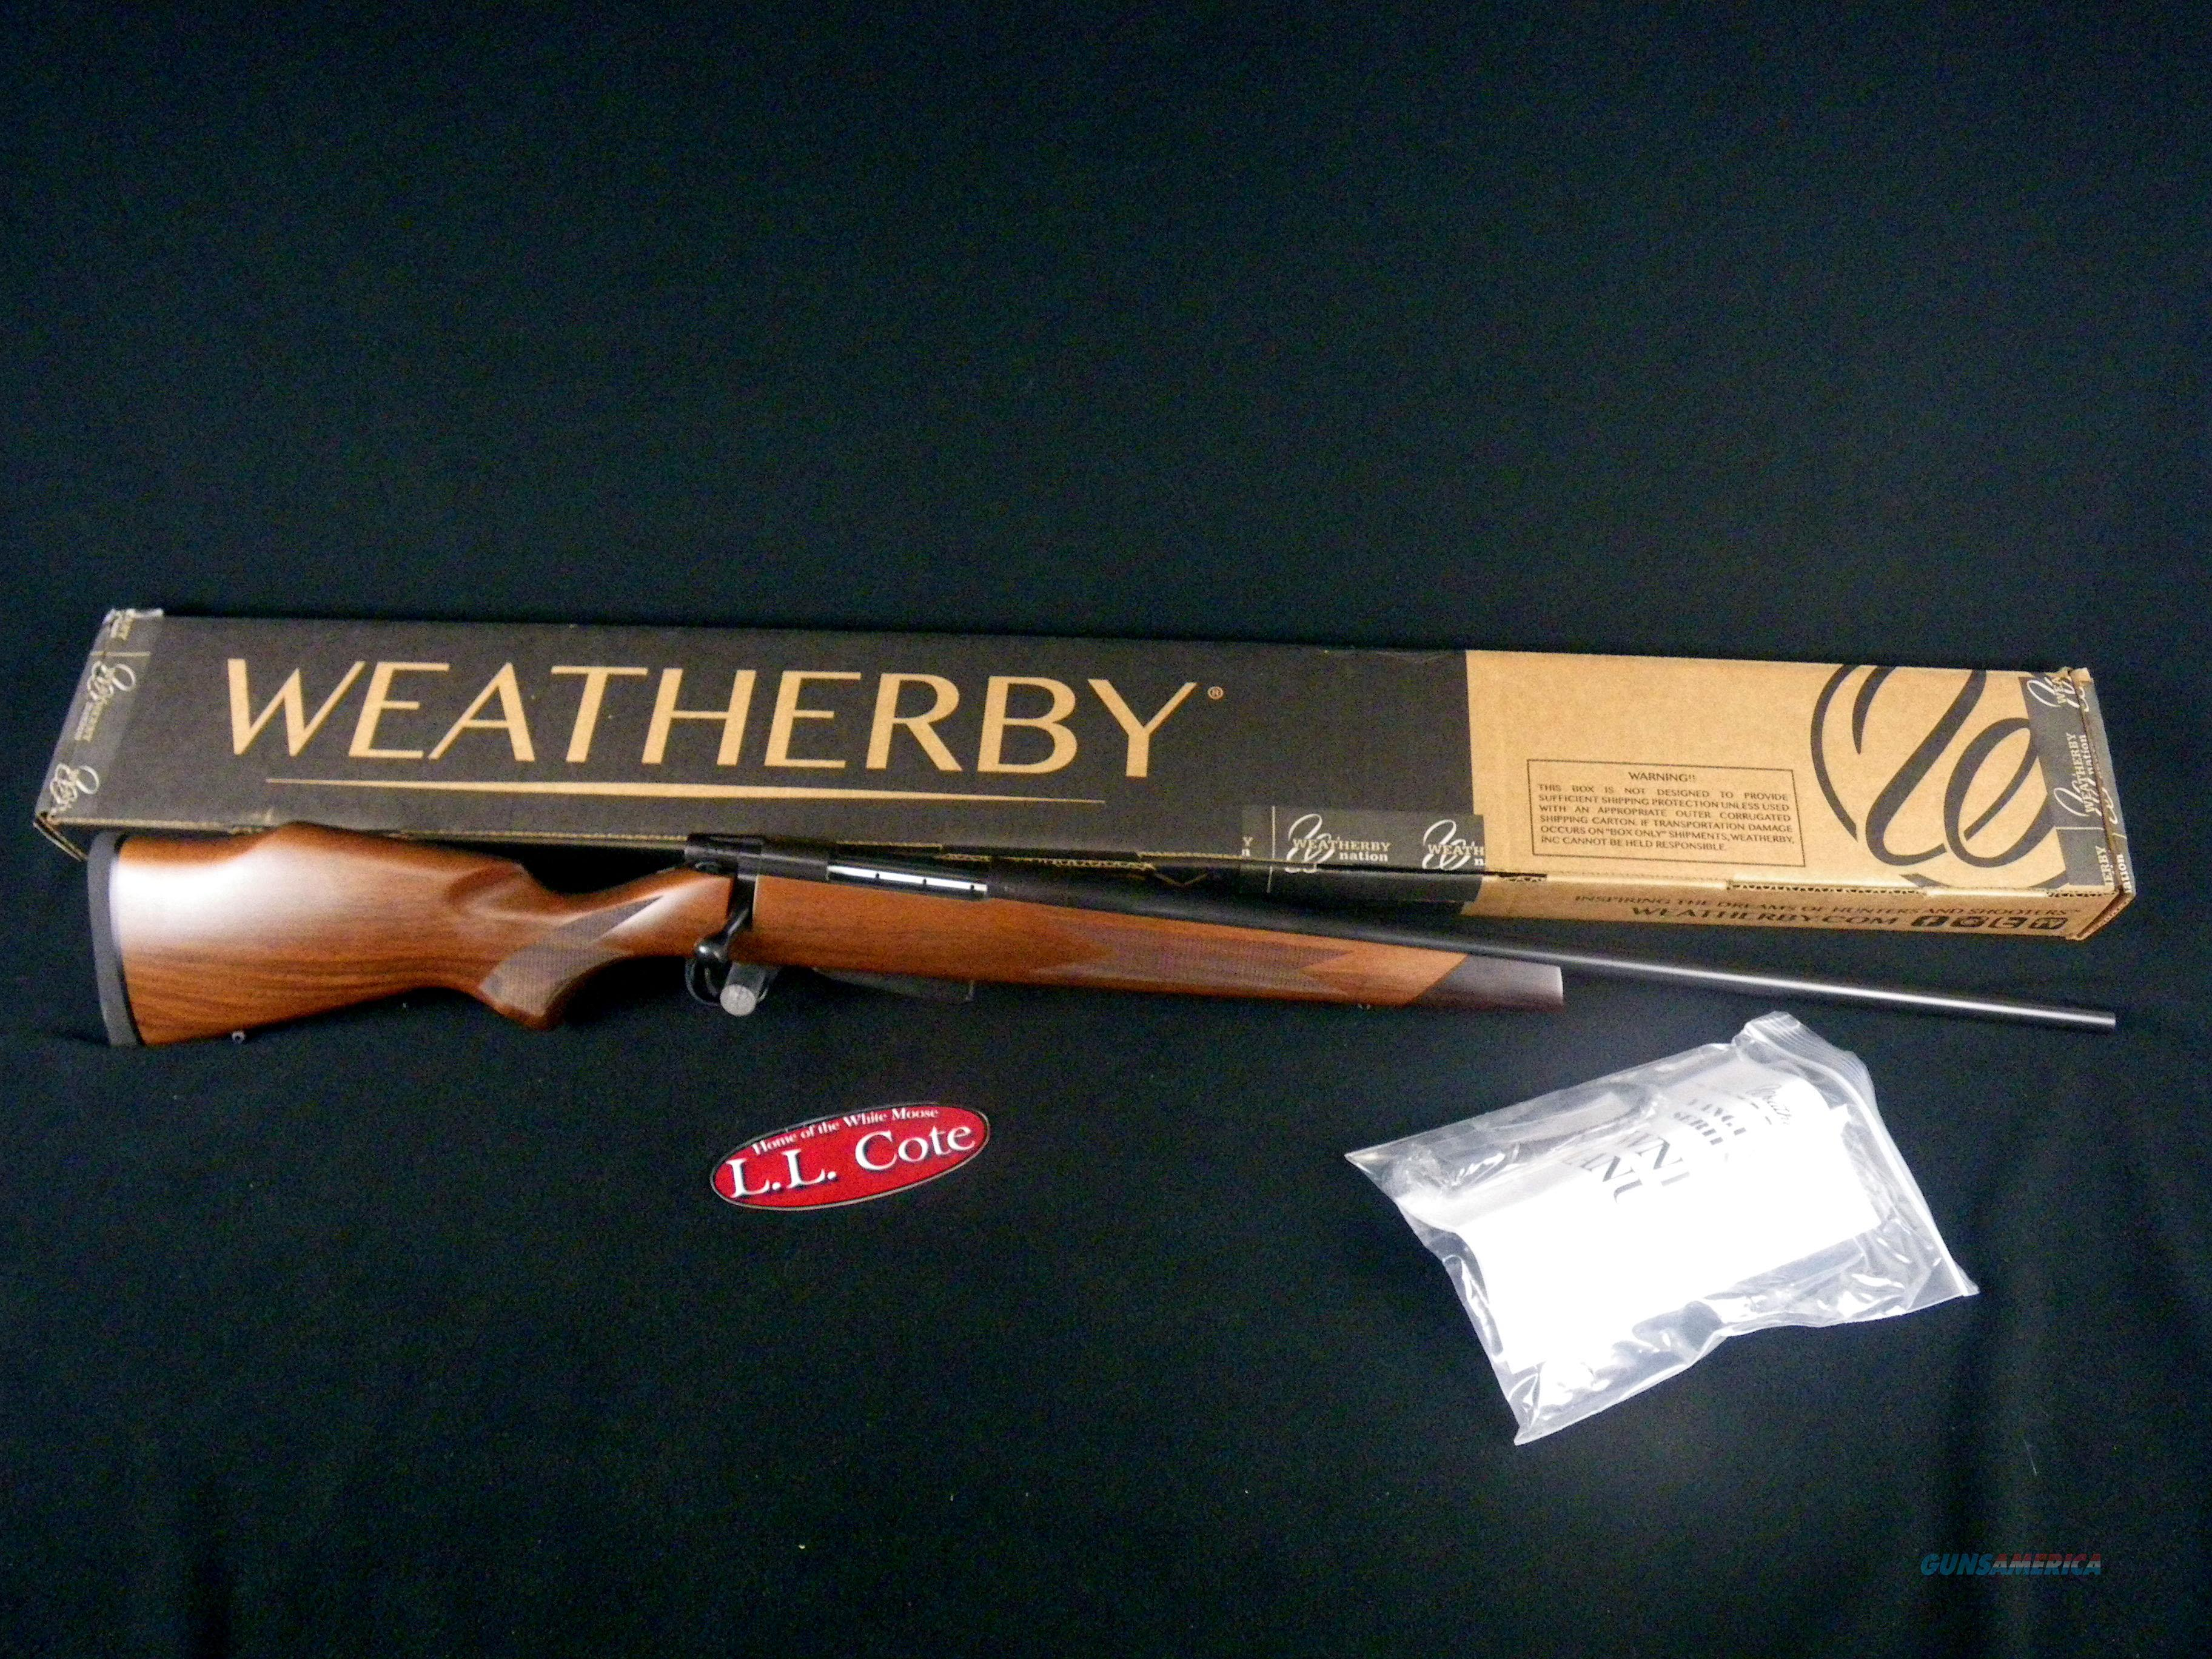 "Weatherby Vanguard S2 Sporter DBM 270win 24"" NEW VAW270NR4O  Guns > Rifles > Weatherby Rifles > Sporting"